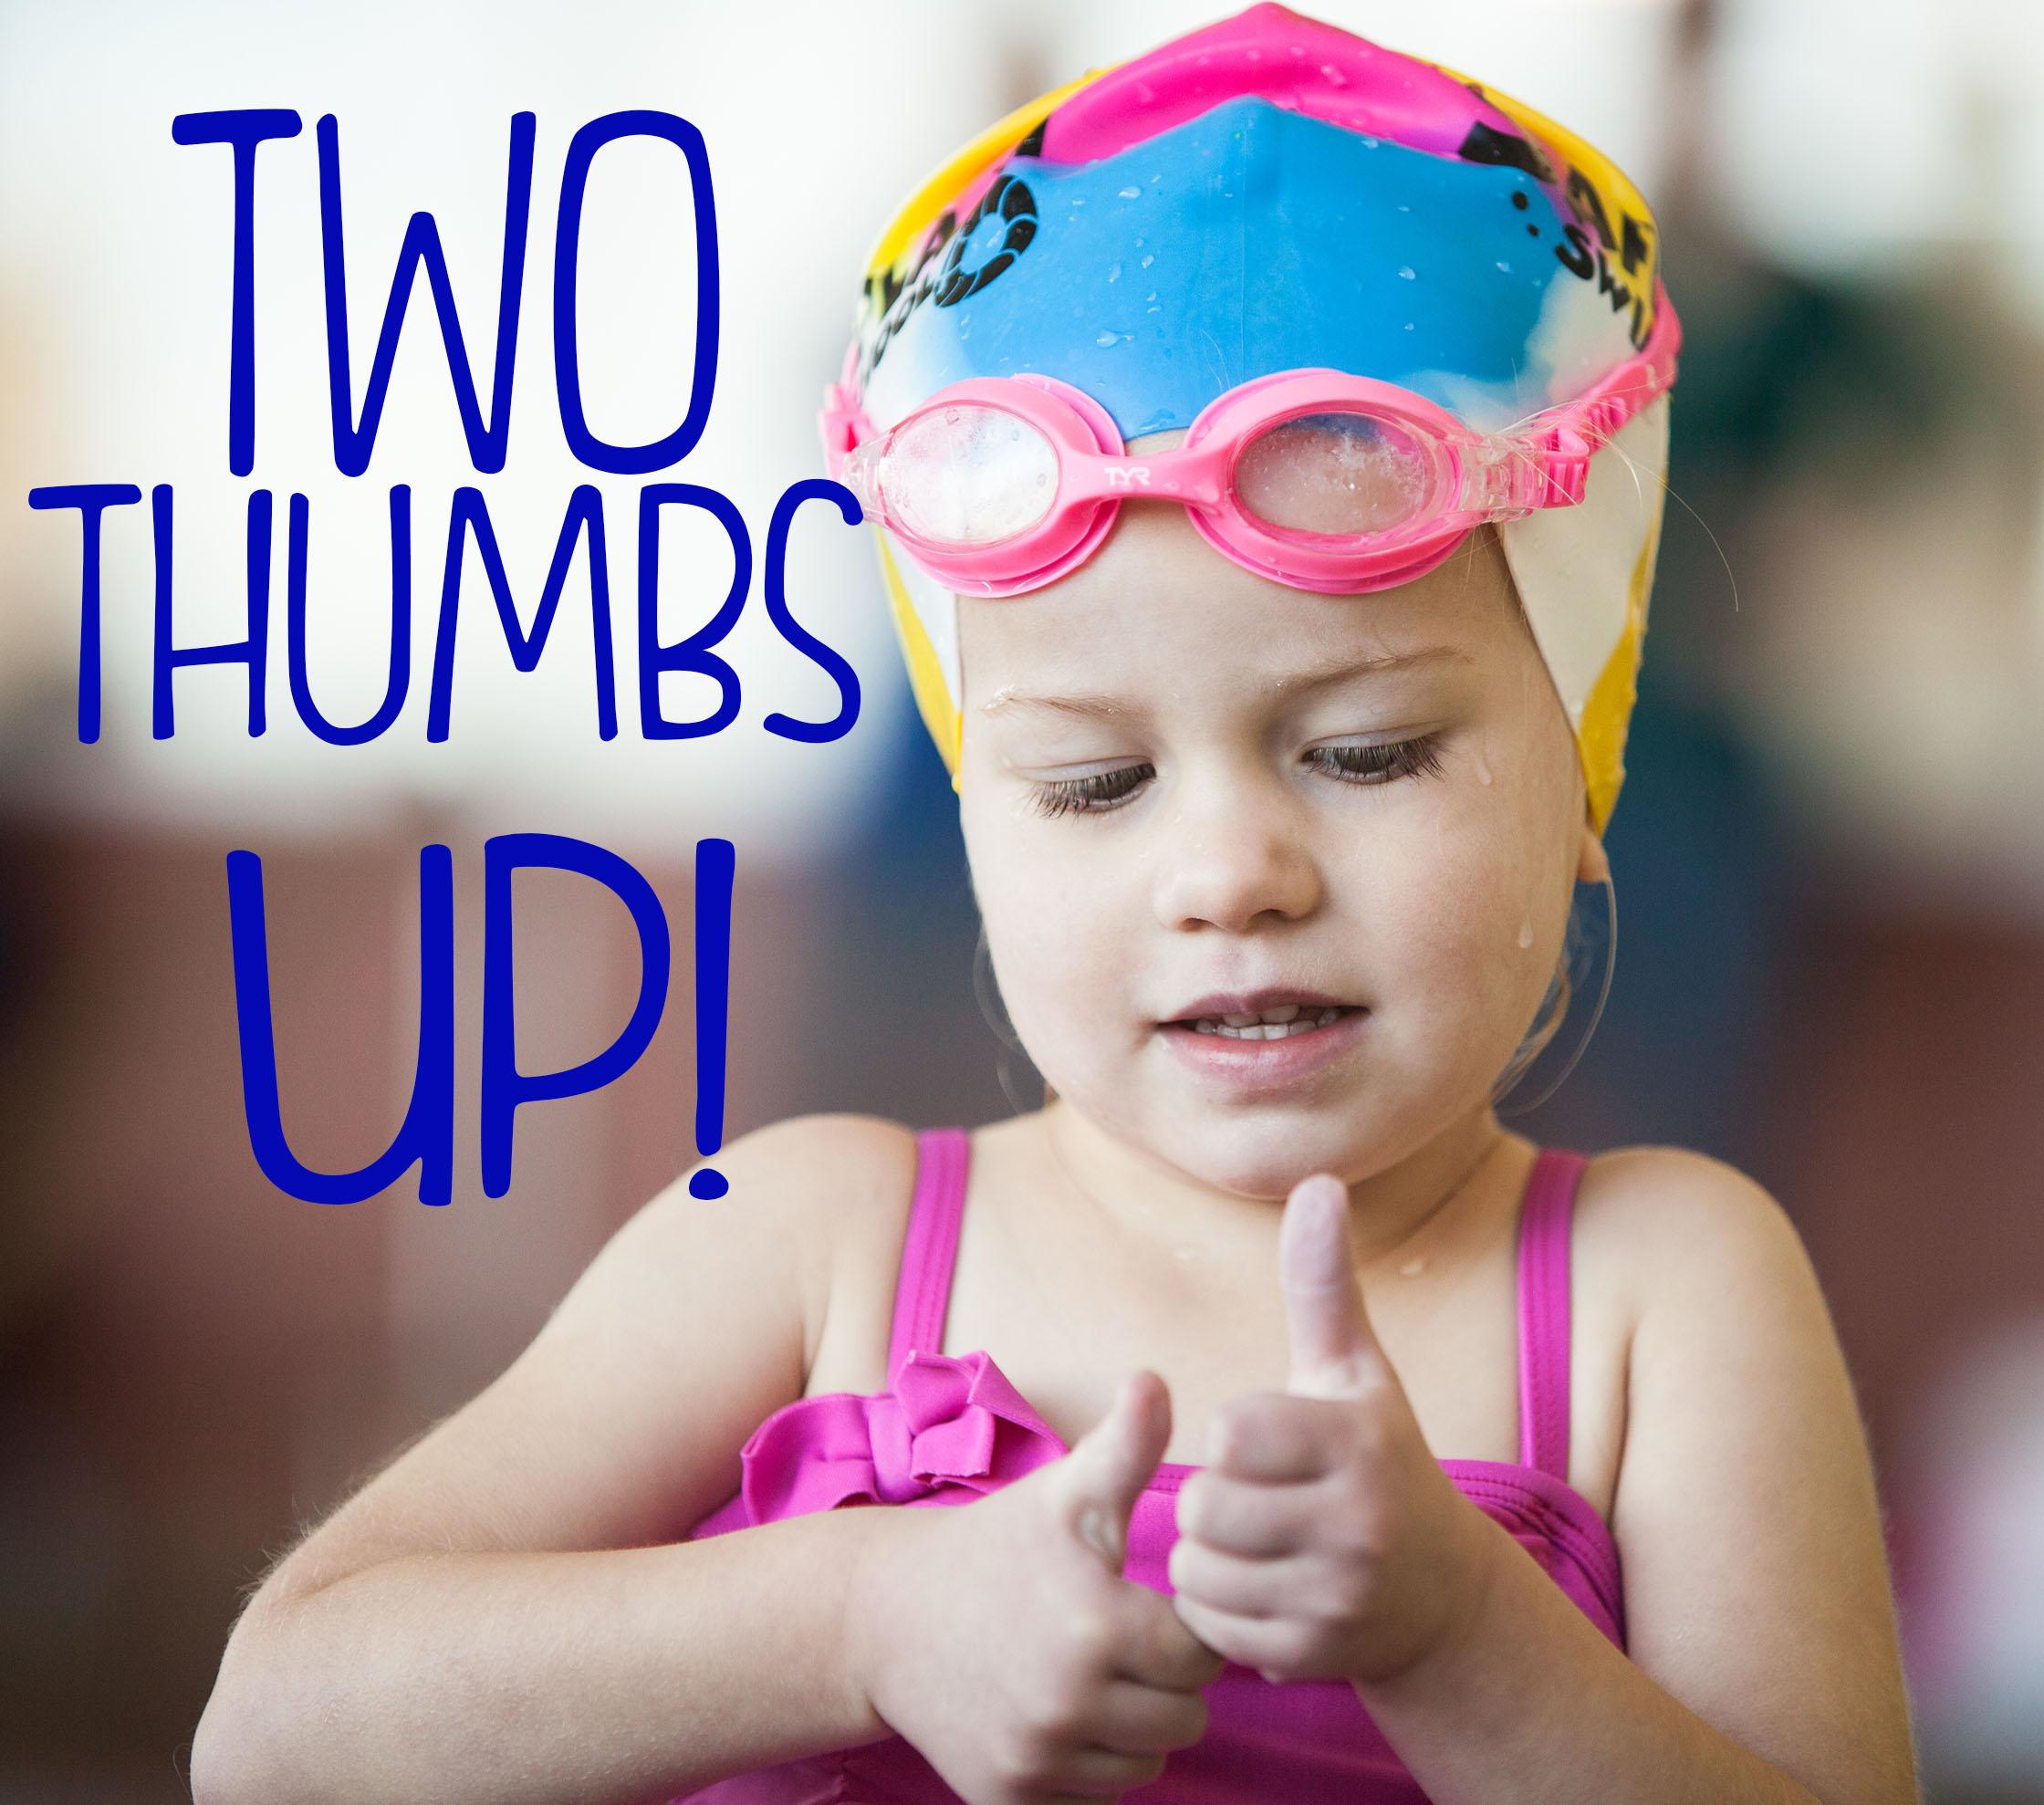 Thumbs_up_TEXT.jpg